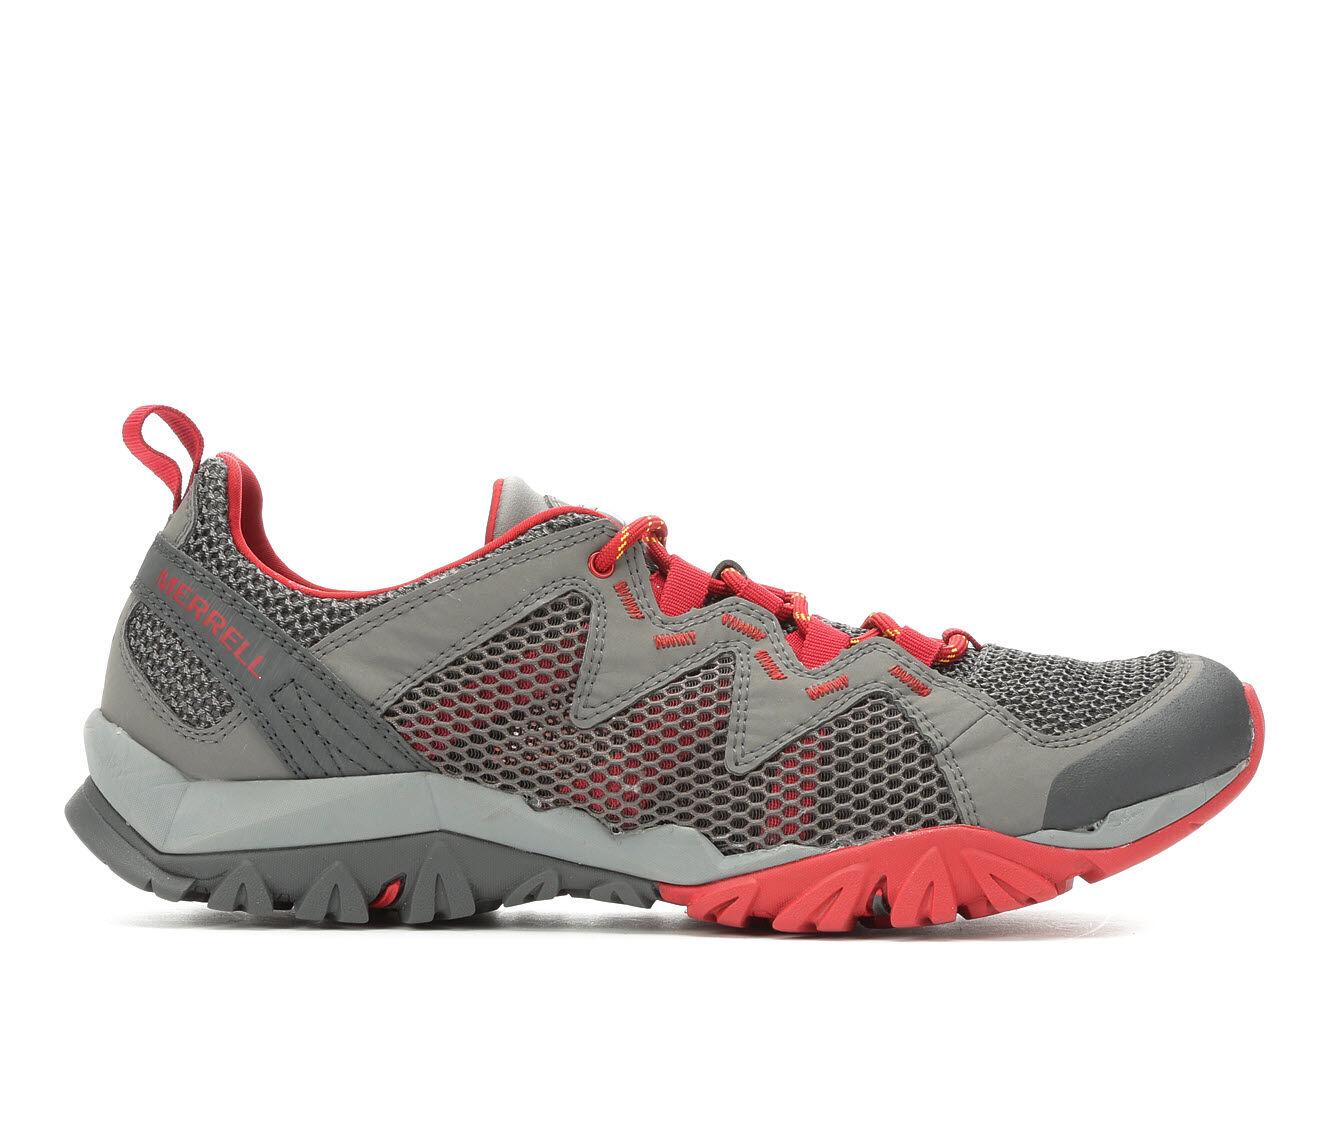 Men's Merrell Tetrex Rapid Crest Hiking Shoes Charcoal